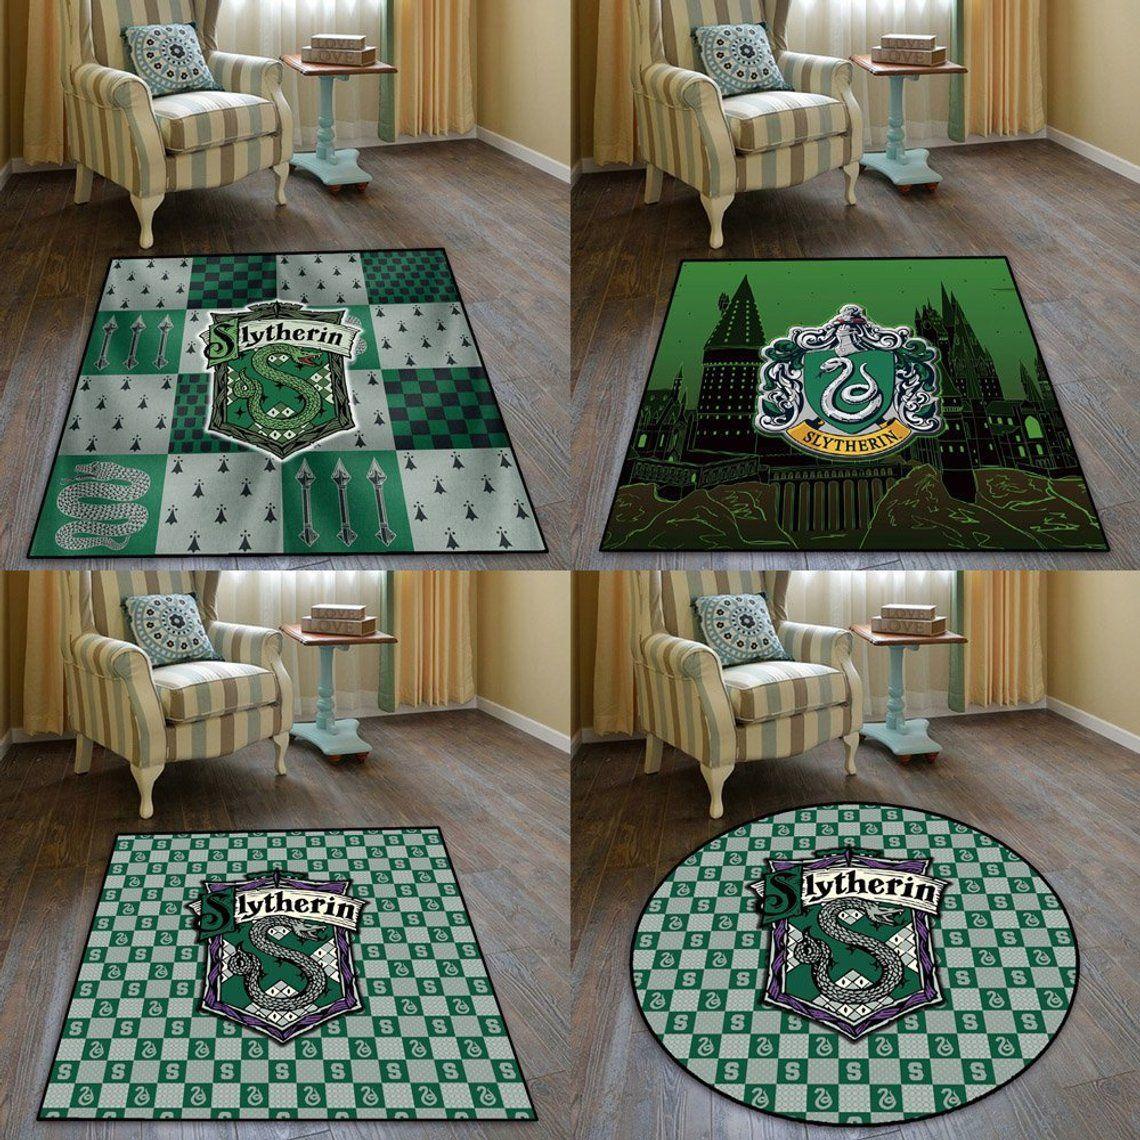 Slytherin Hogwarts Anime Cool Velboa Floor Rug Carpet Living Room